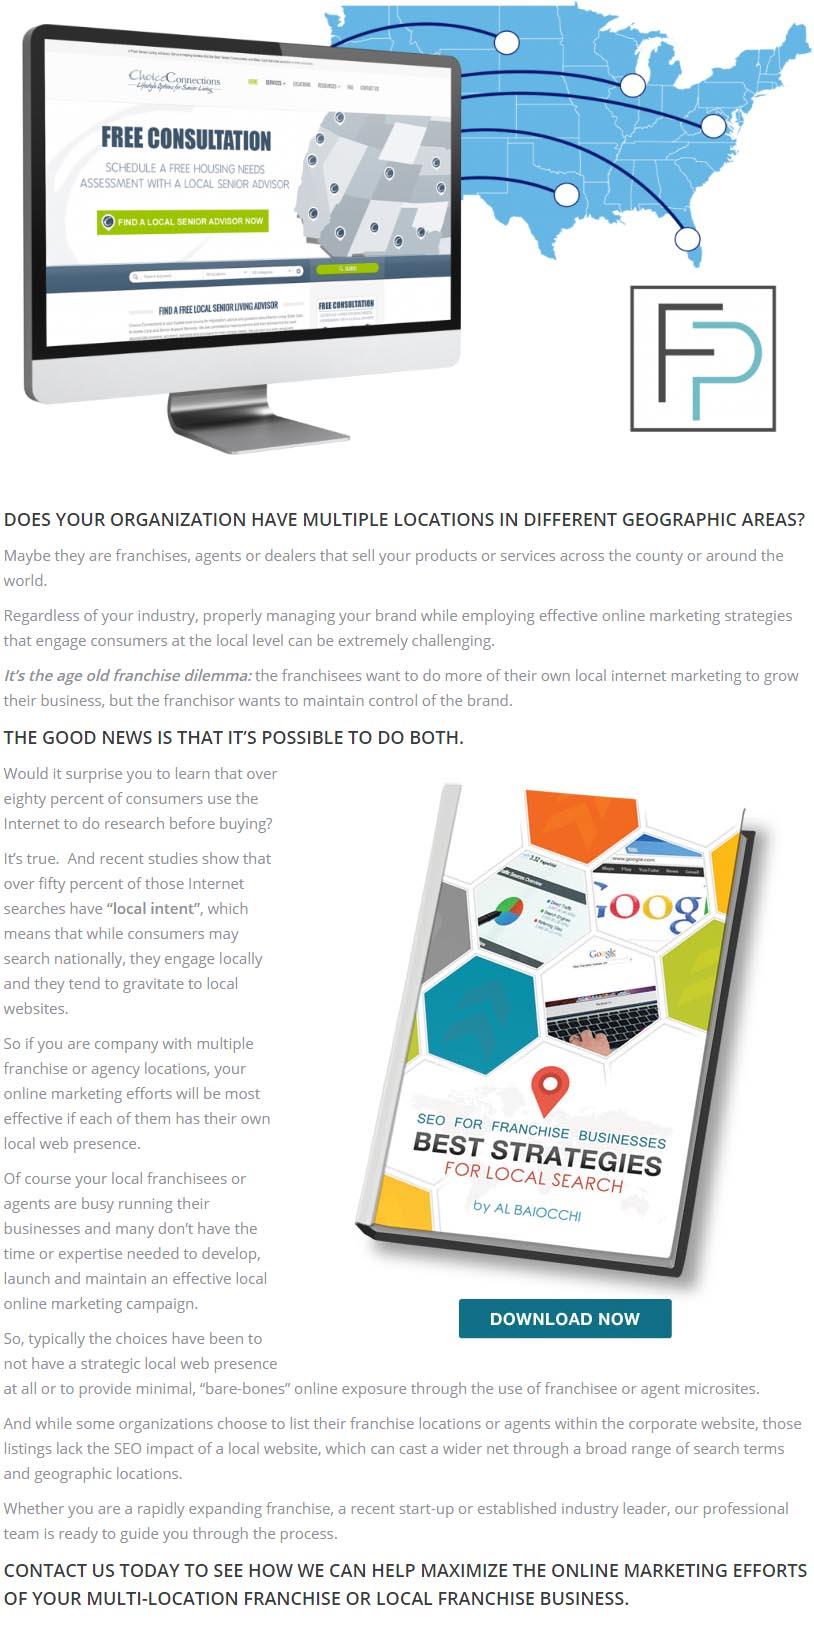 FrontPage Interactive, LLC, website design business website design company website marketing companies, website marketing company, website marketing design